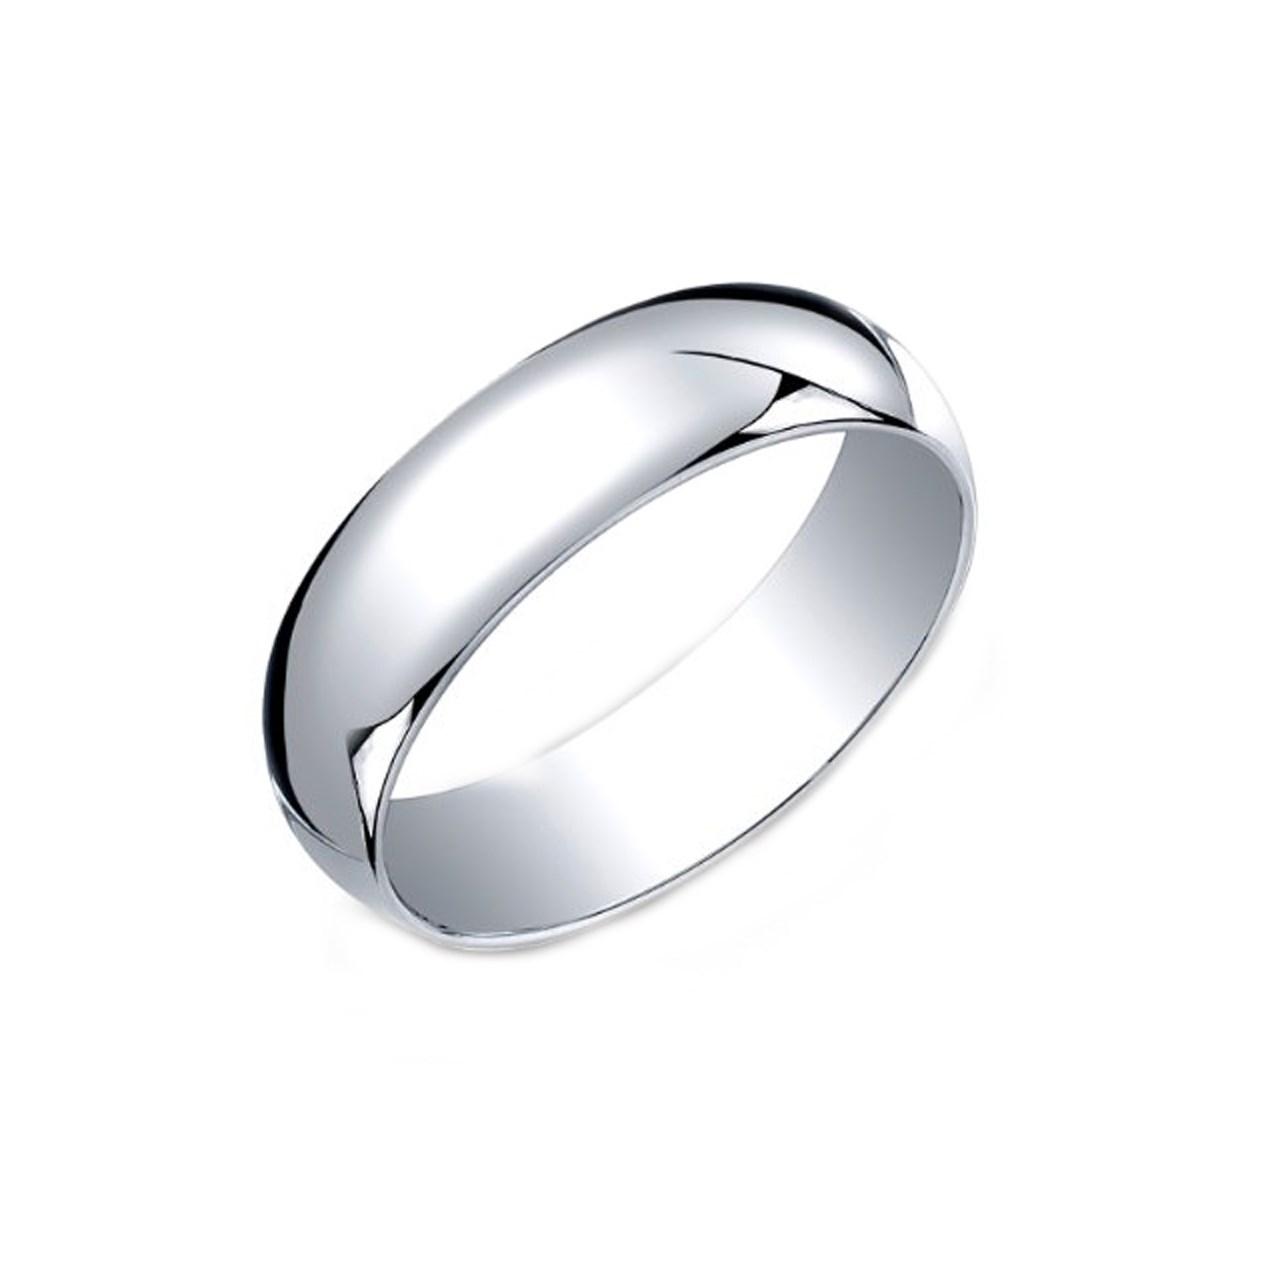 قیمت انگشتر اسپادانا طرح حلقه ساده کد L0061